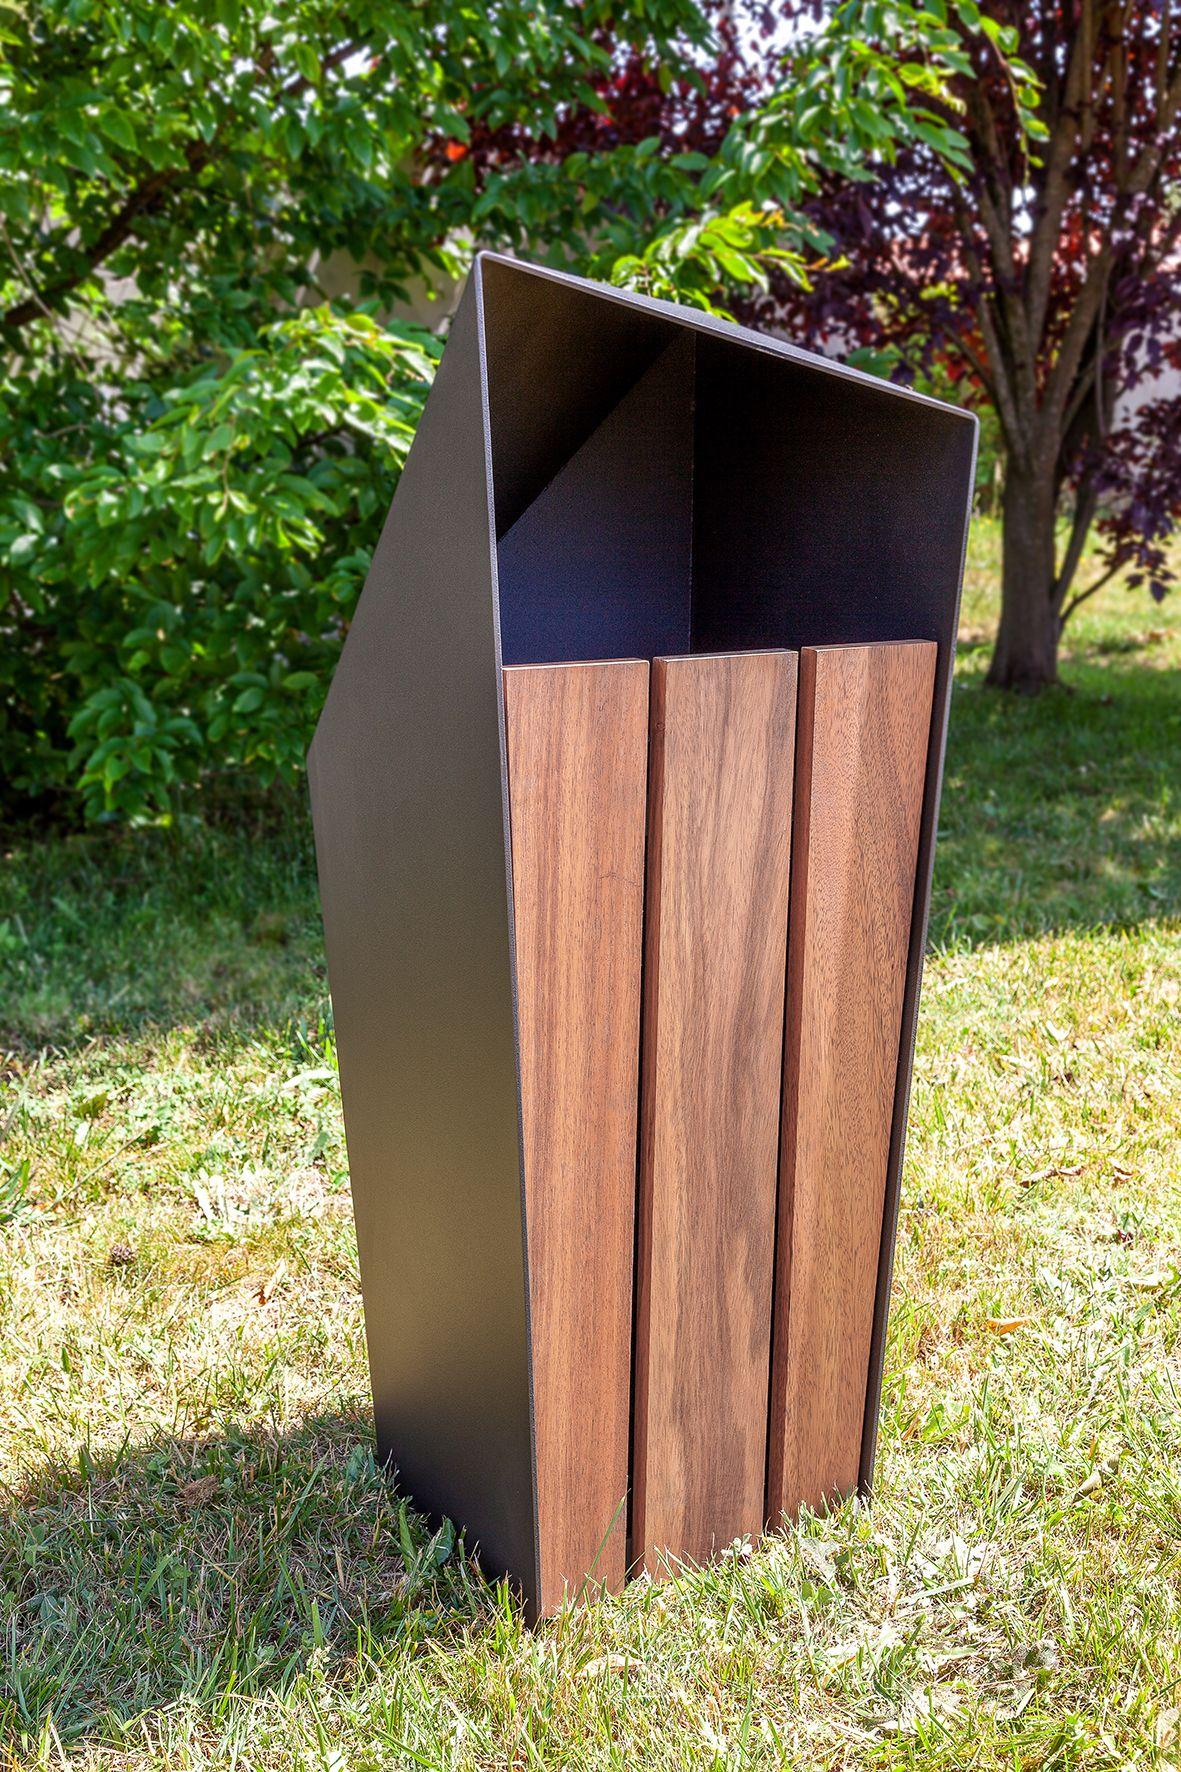 Skew Waste Bin Skew Collection By Sit Design F 224 Bio Sousa Litter Bin Parking Design Urban